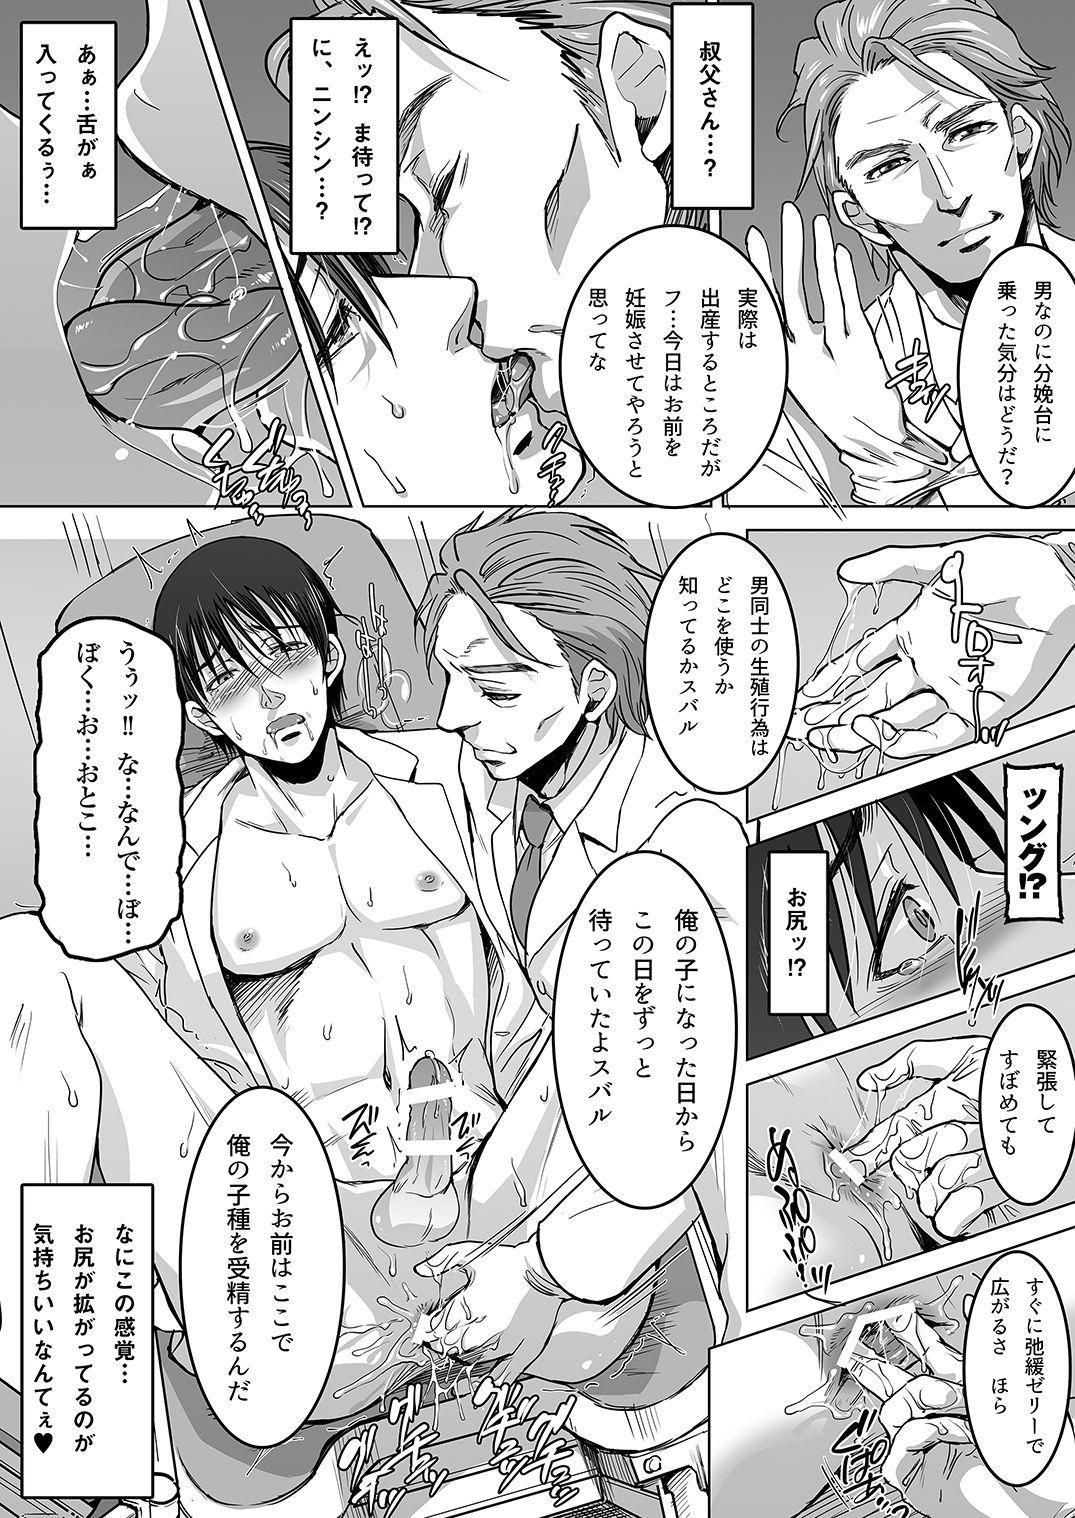 DLsite Girl's Maniax Anthology vol.4 28